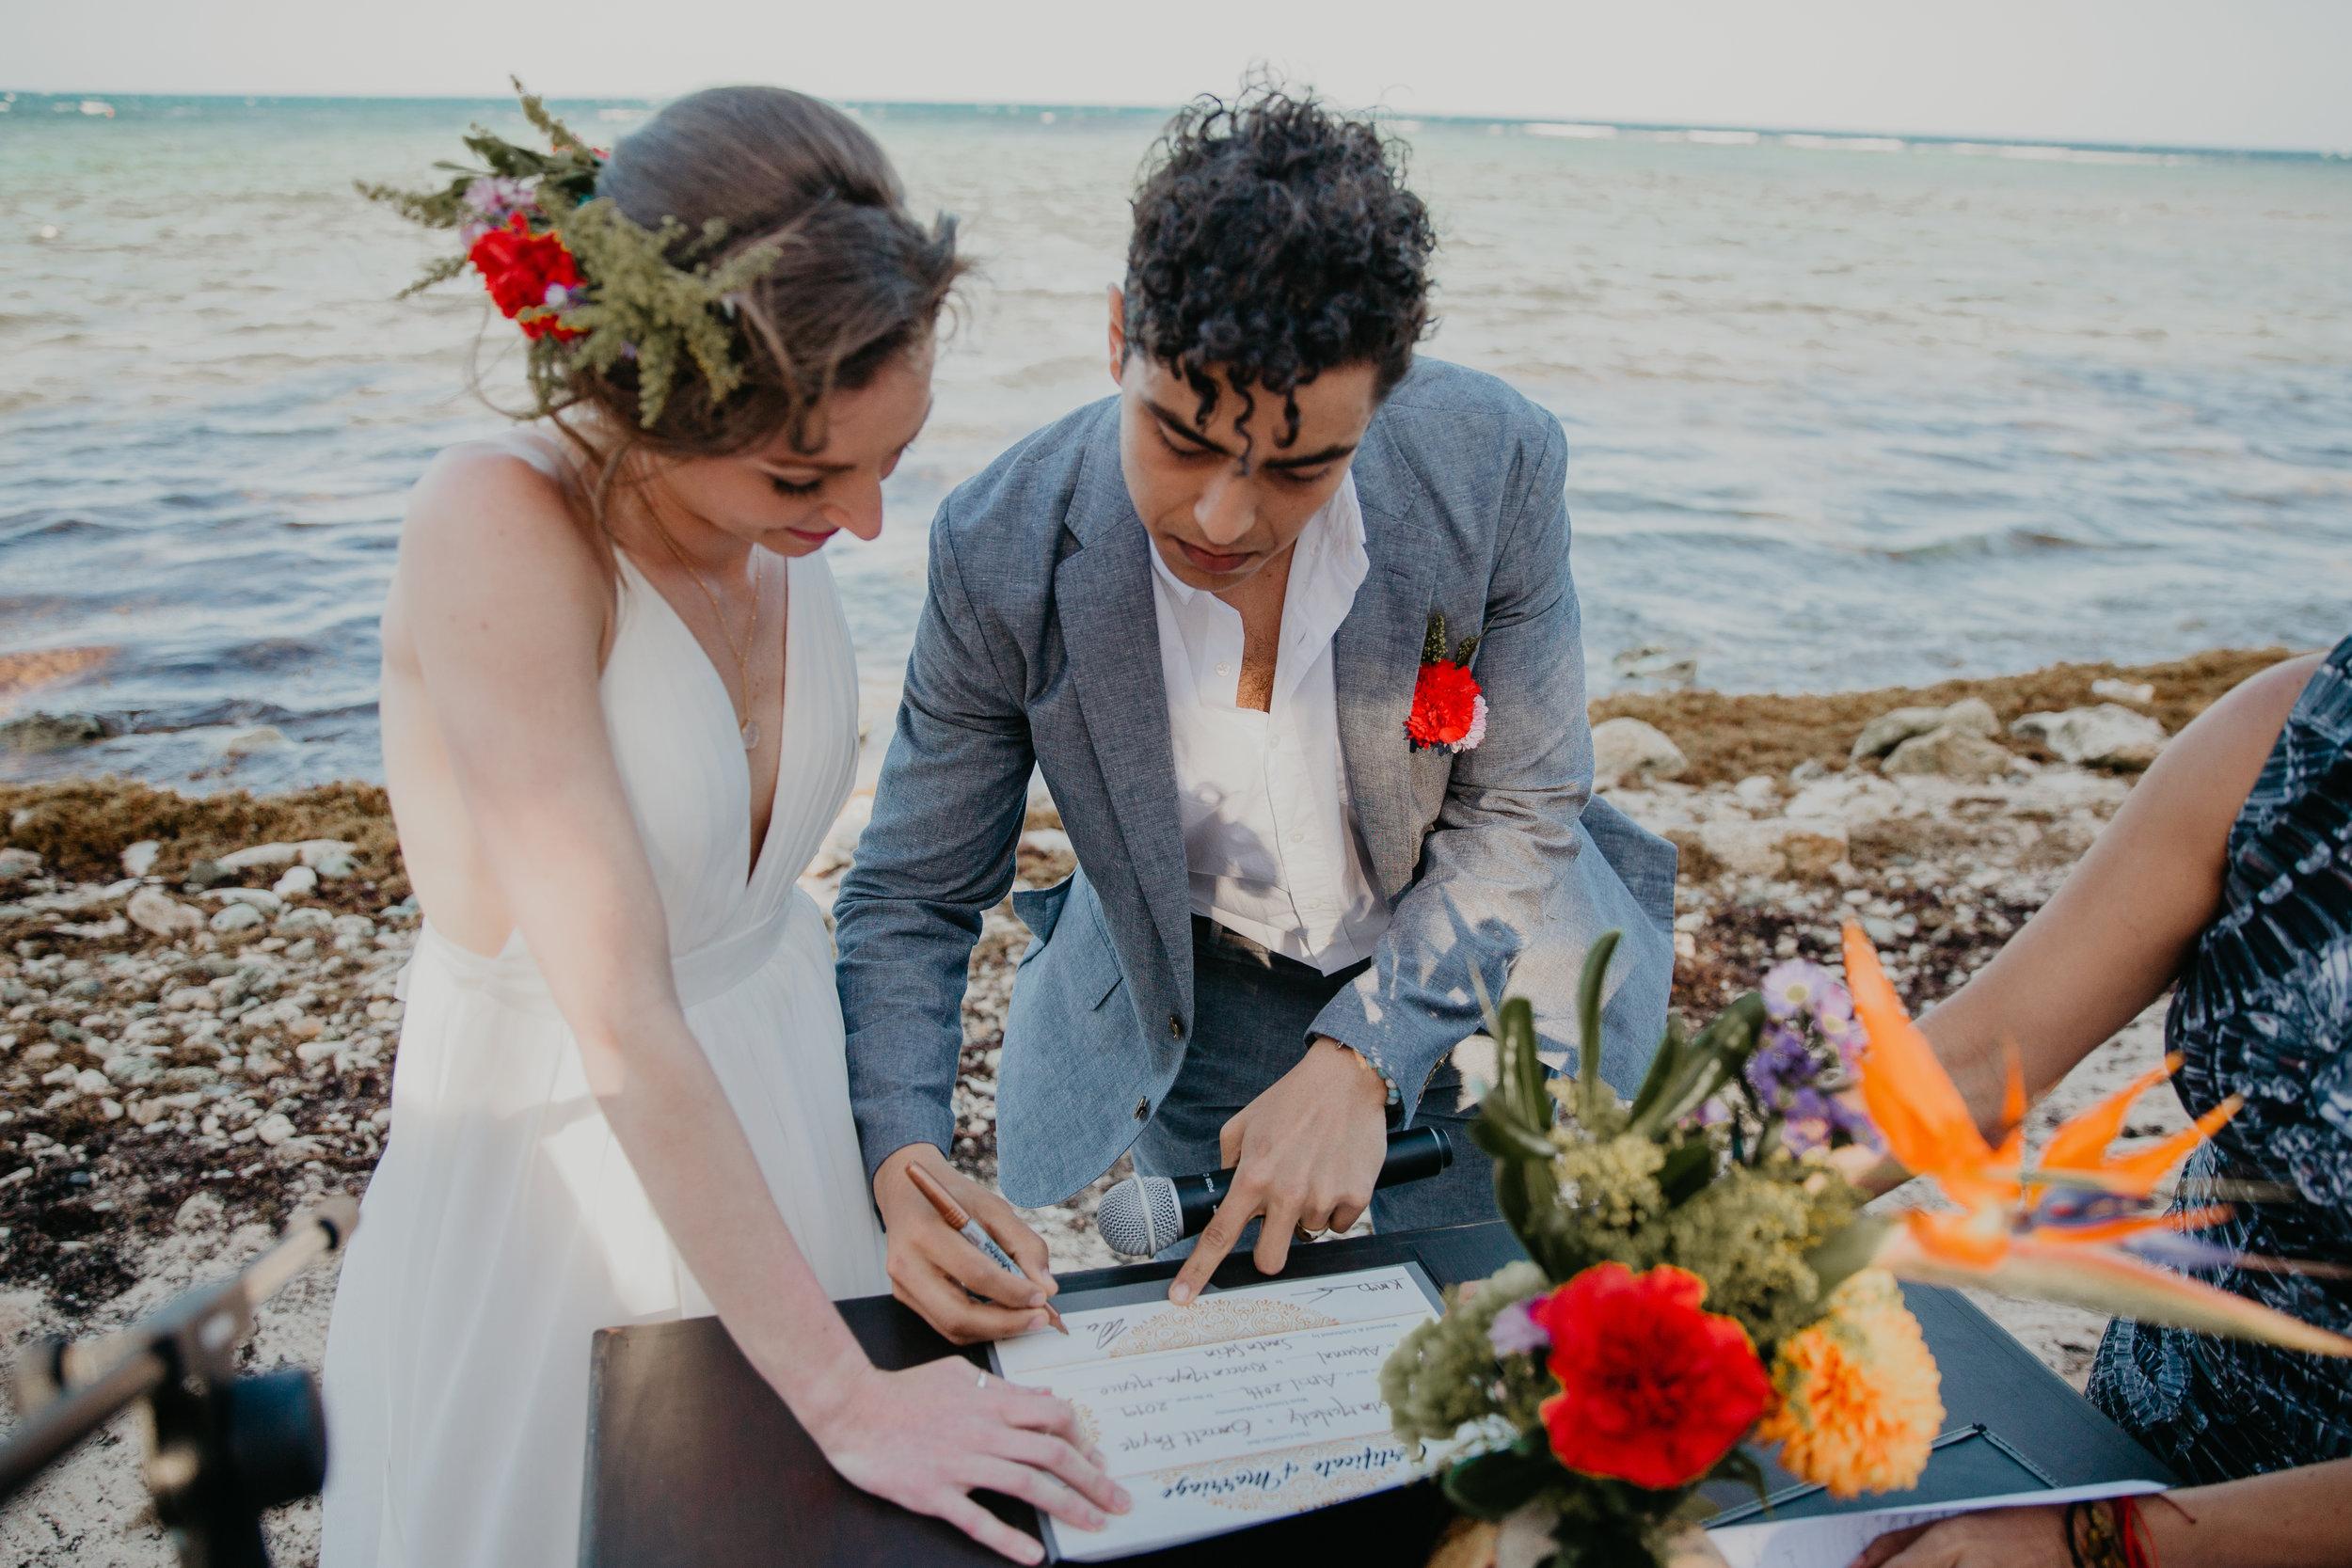 Nicole-Daacke-Photography-beachfront-akumal-destionation-wedding-tulum-mexico-elopement-photographer-destination-wedding-inspiration-sunset-champagne-pop-boho-bride-ocean-tropical-bohemian-tulum-wedding-photos-172.jpg